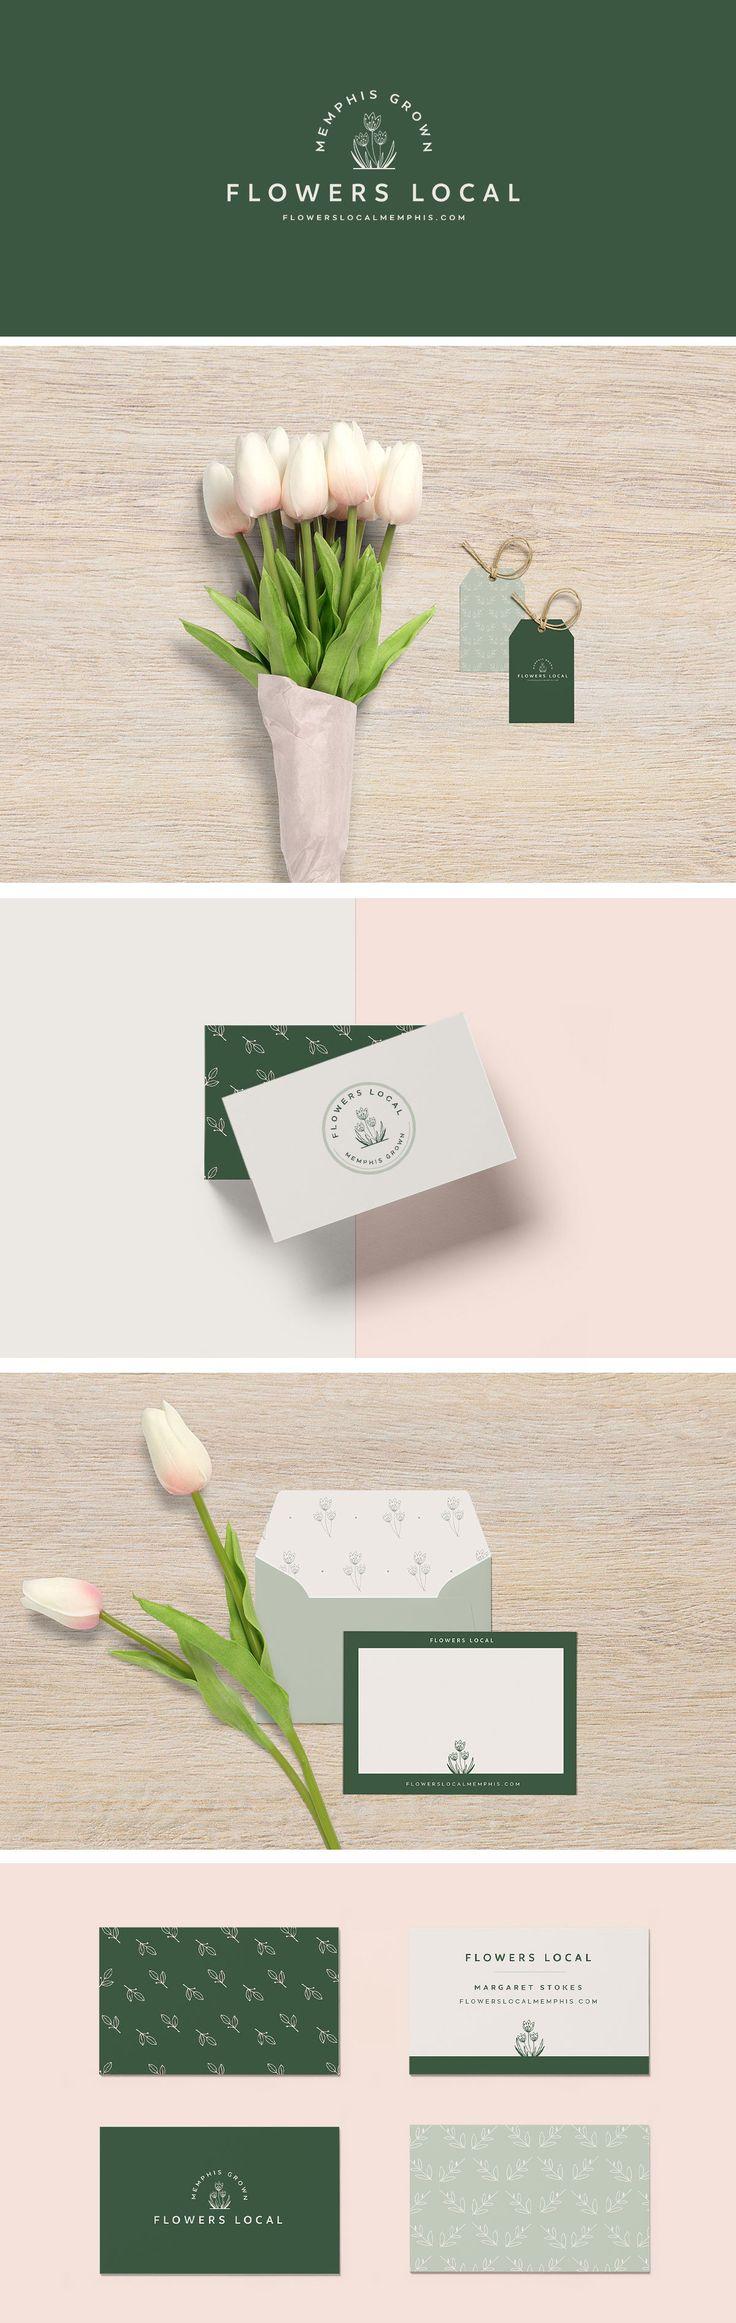 Flowers Local Branding Design- graphic design, branding, logo design, feminine design, web design, blog design, #graphicdesign, #designinspiration, #branding, #logodesign #brandingidentity